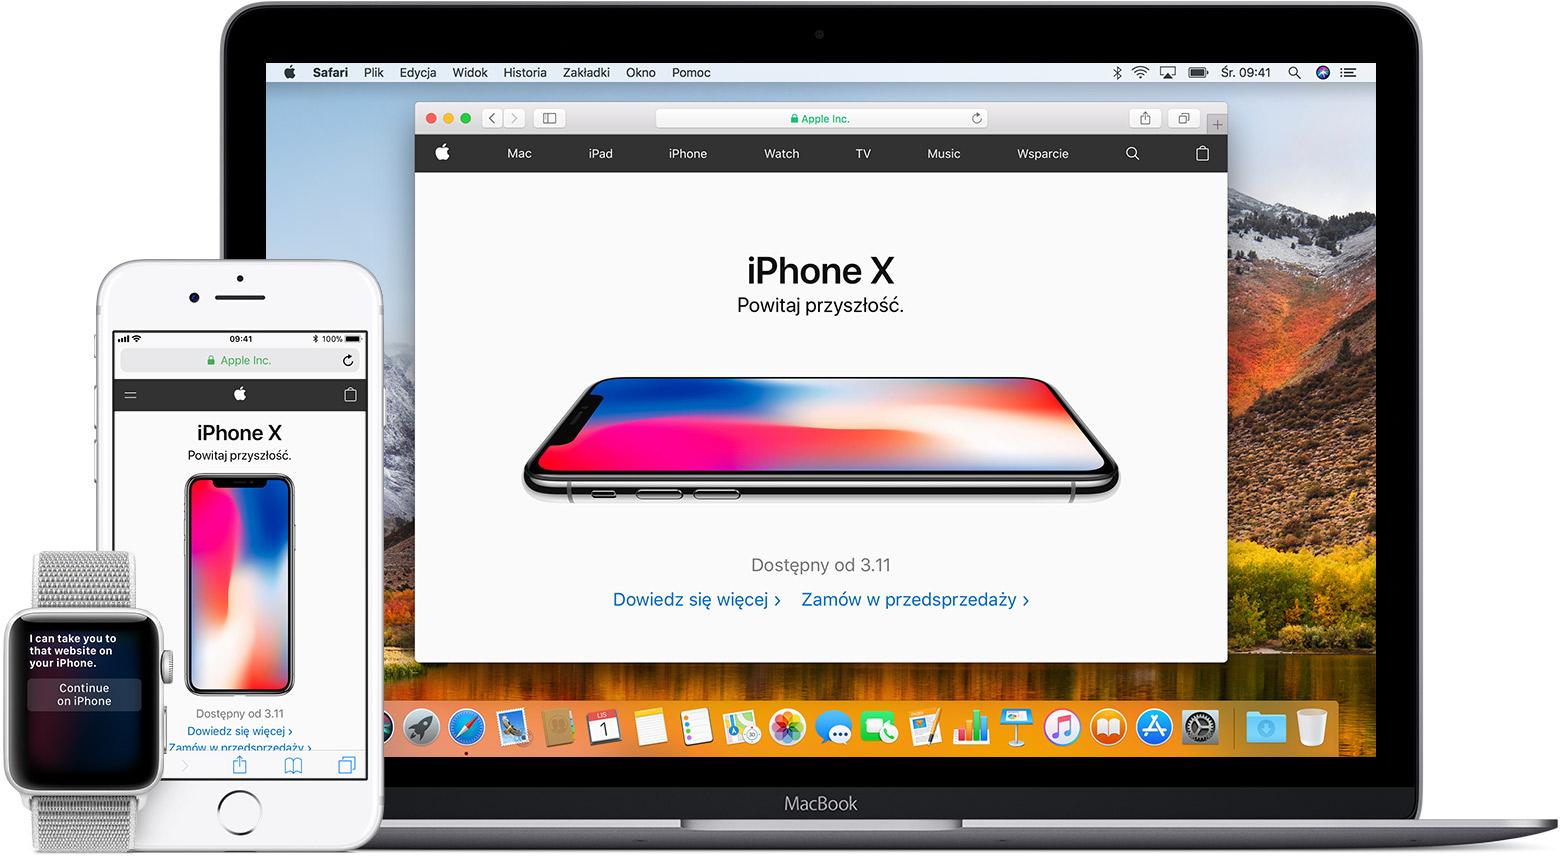 Łączenie komputera Mac, telefonu iPhone, iPada, iPoda ...